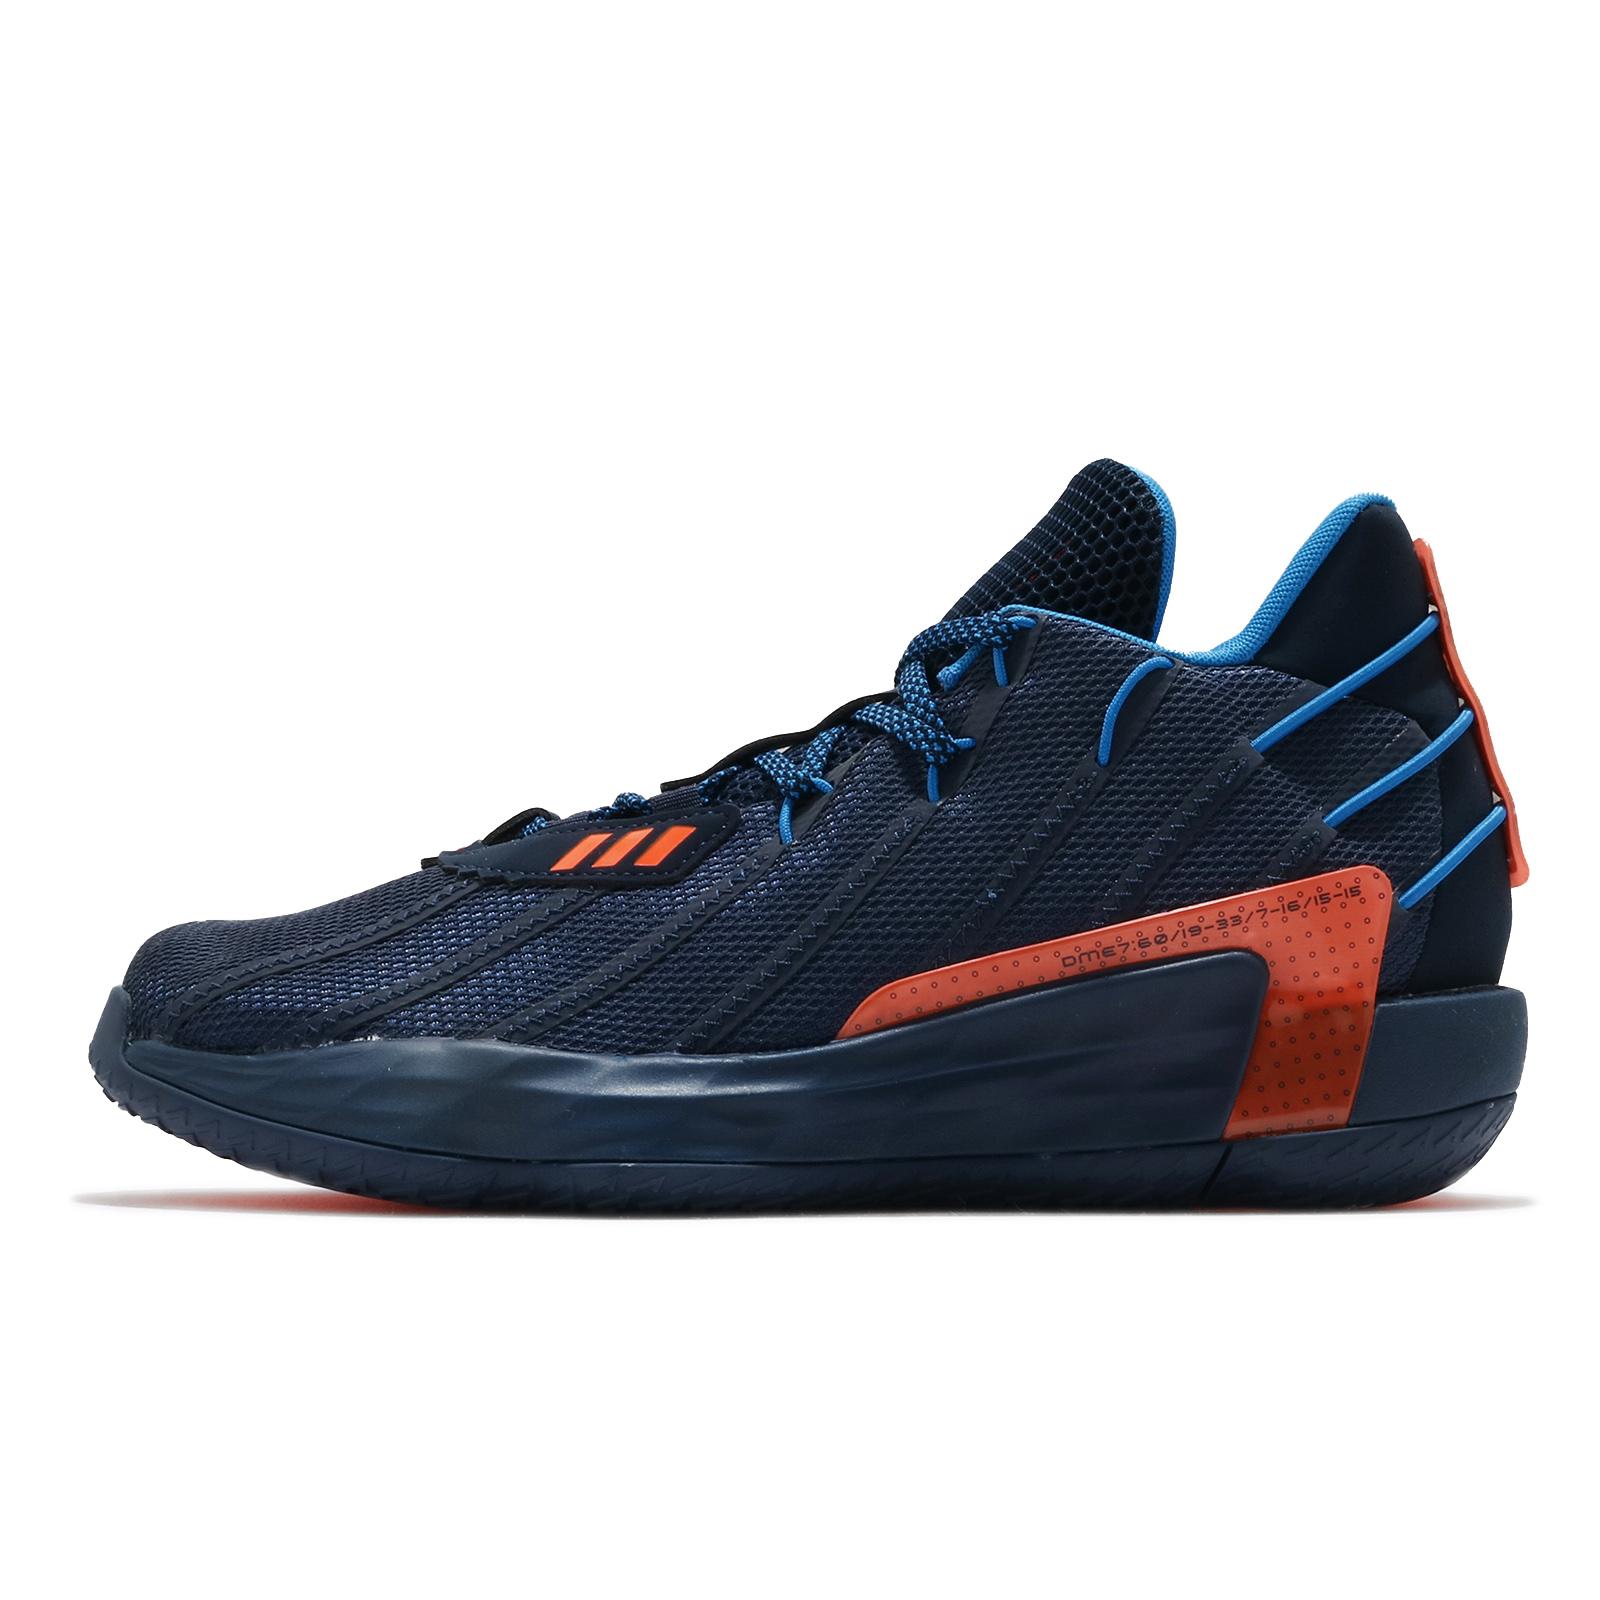 adidas 籃球鞋 Dame 7 Lights Out 藍 橘 男鞋 小李 生涯紀錄紀念款 【ACS】 FZ1103